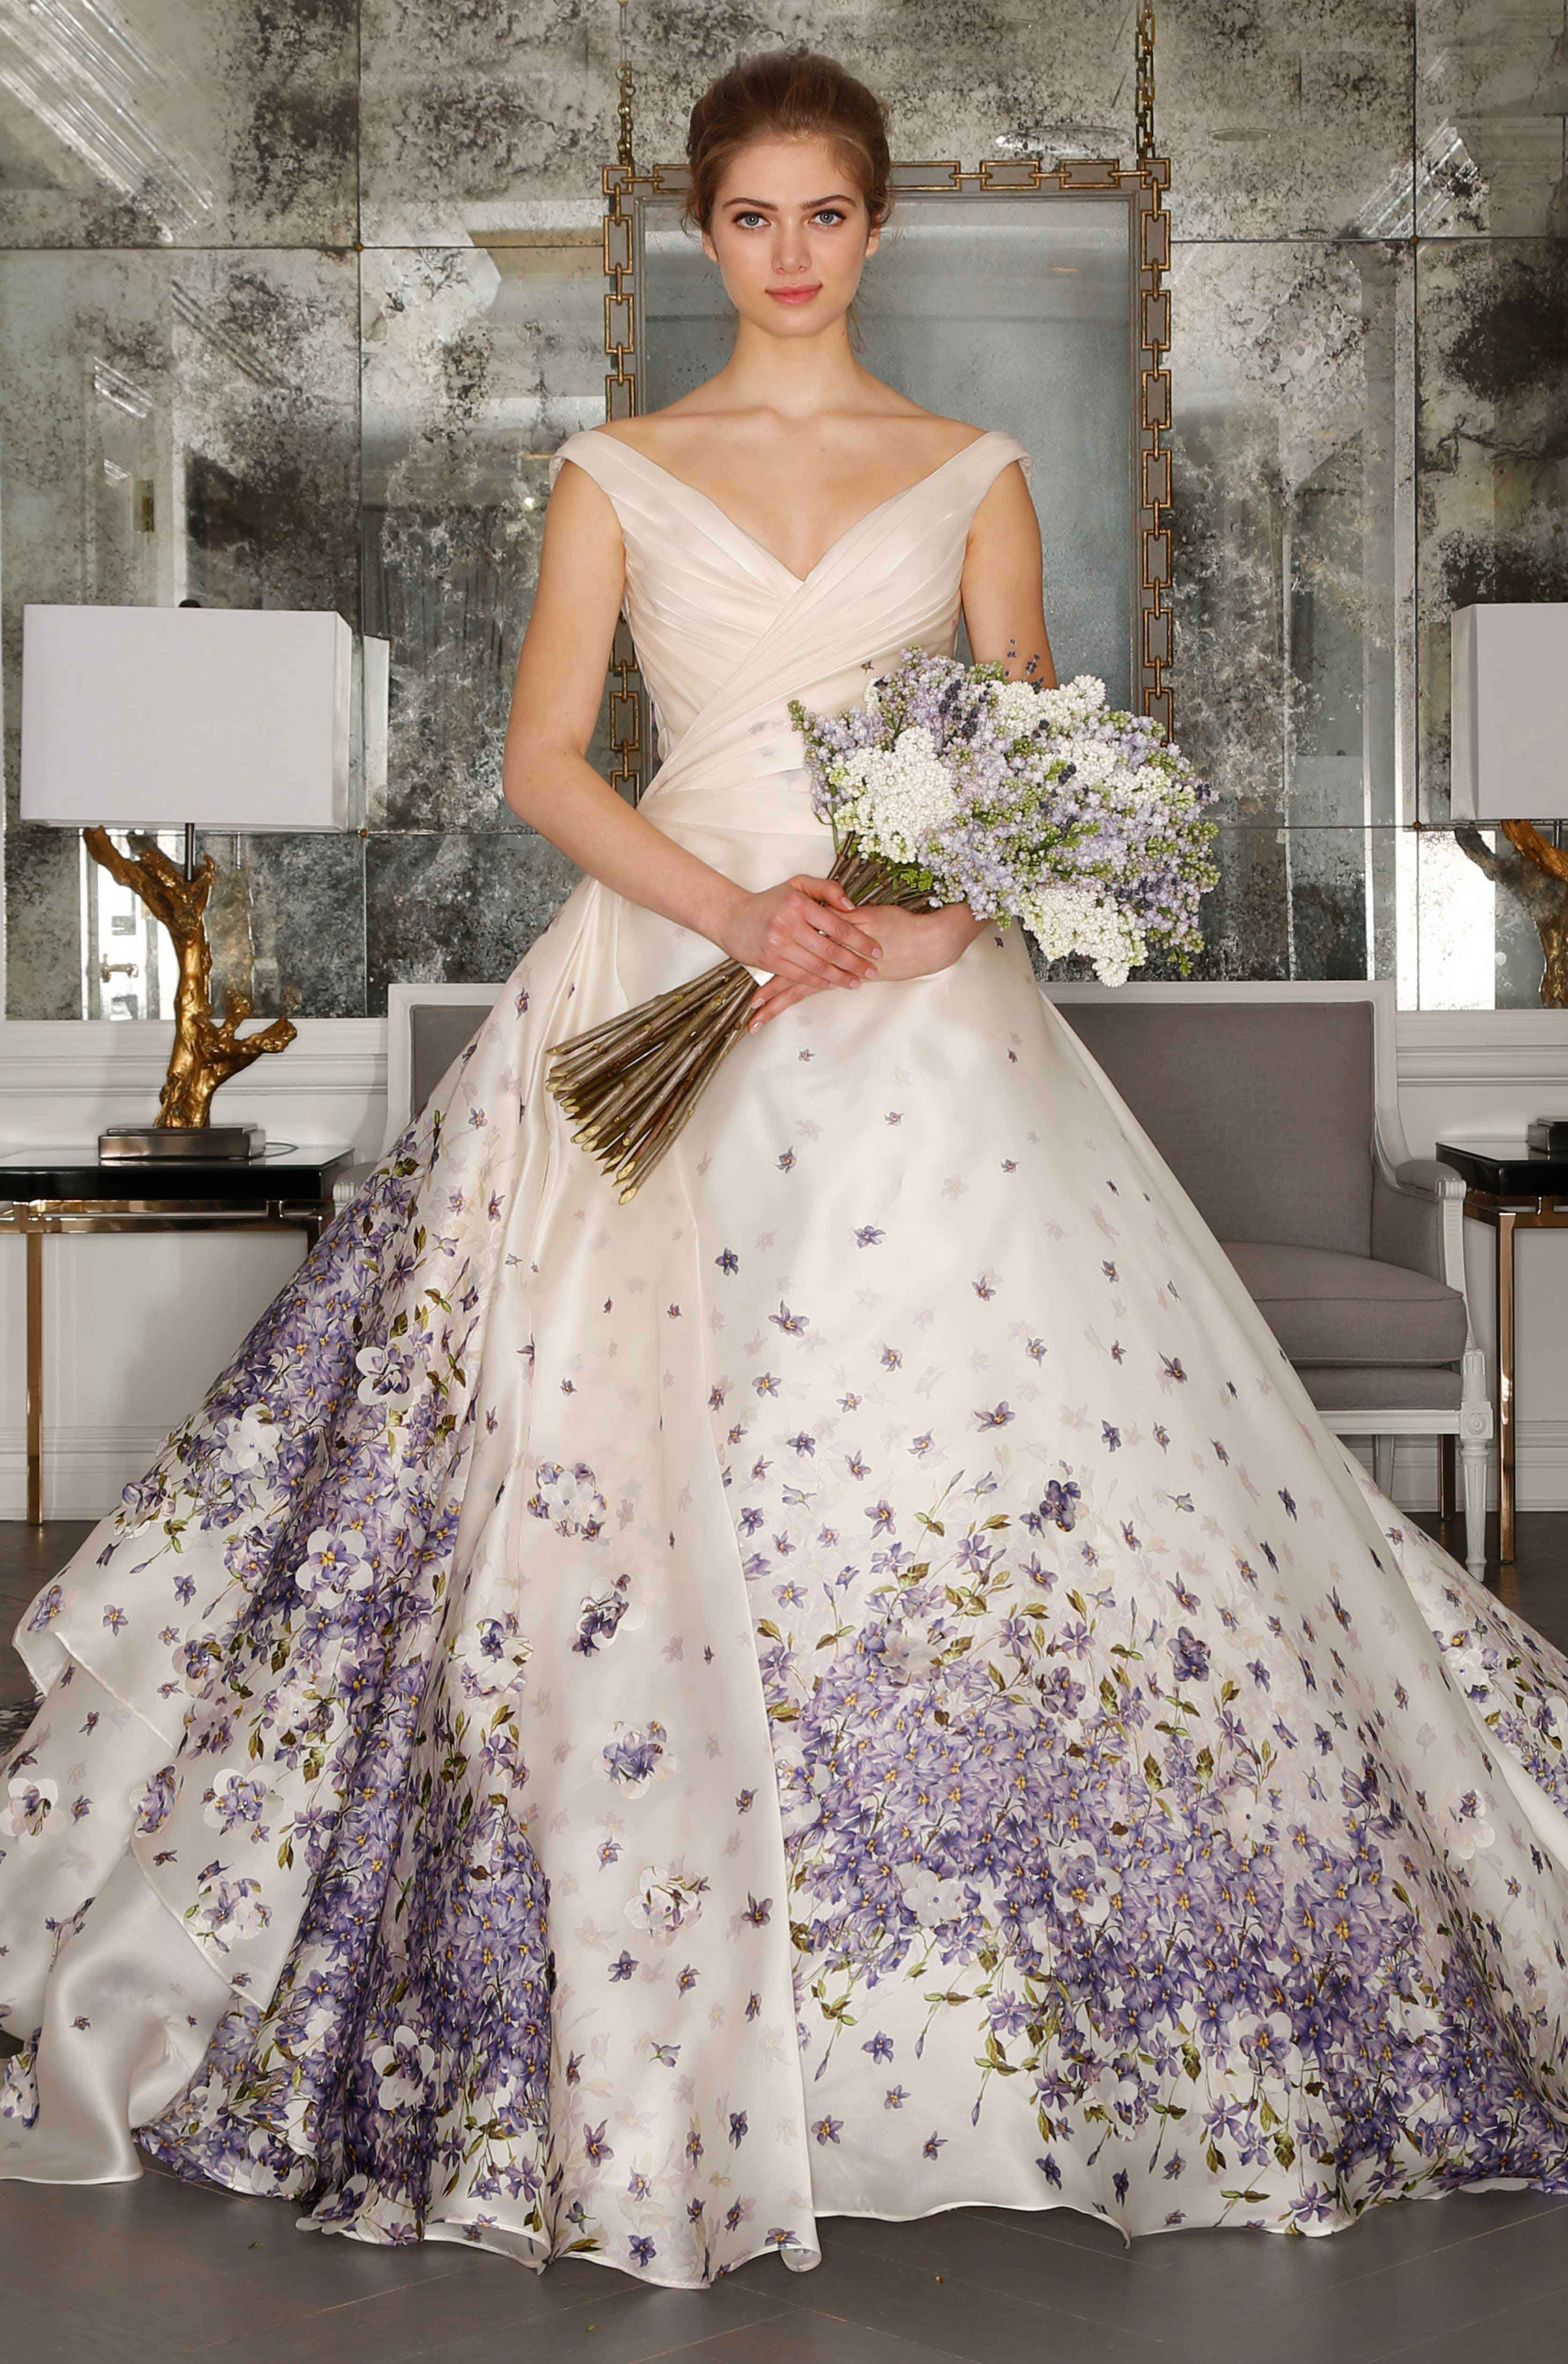 Floral print wedding dresses   Floral Print Wedding Dresses for Trendy Brides  Floral print